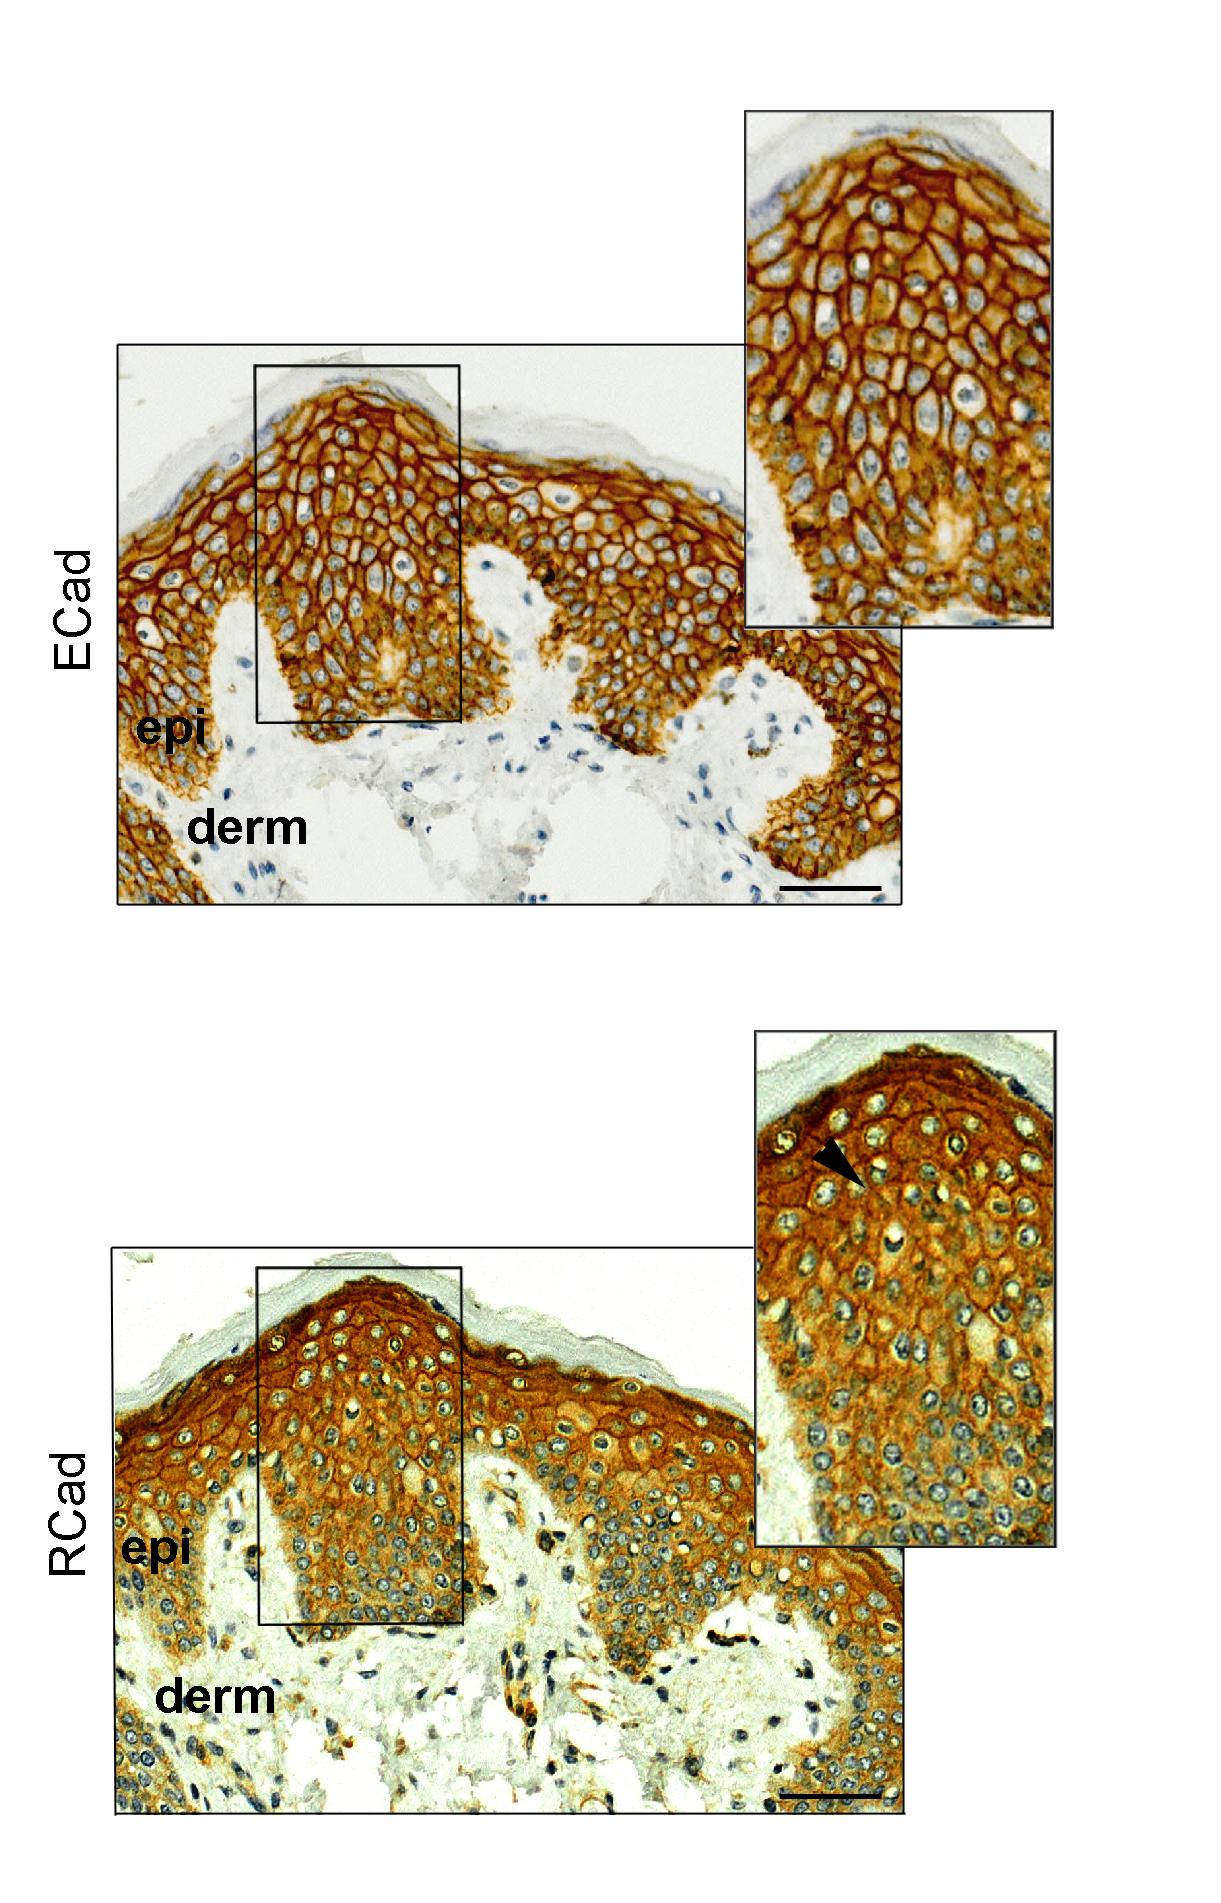 E-Caderina and R-Caderina in Breast Cancer